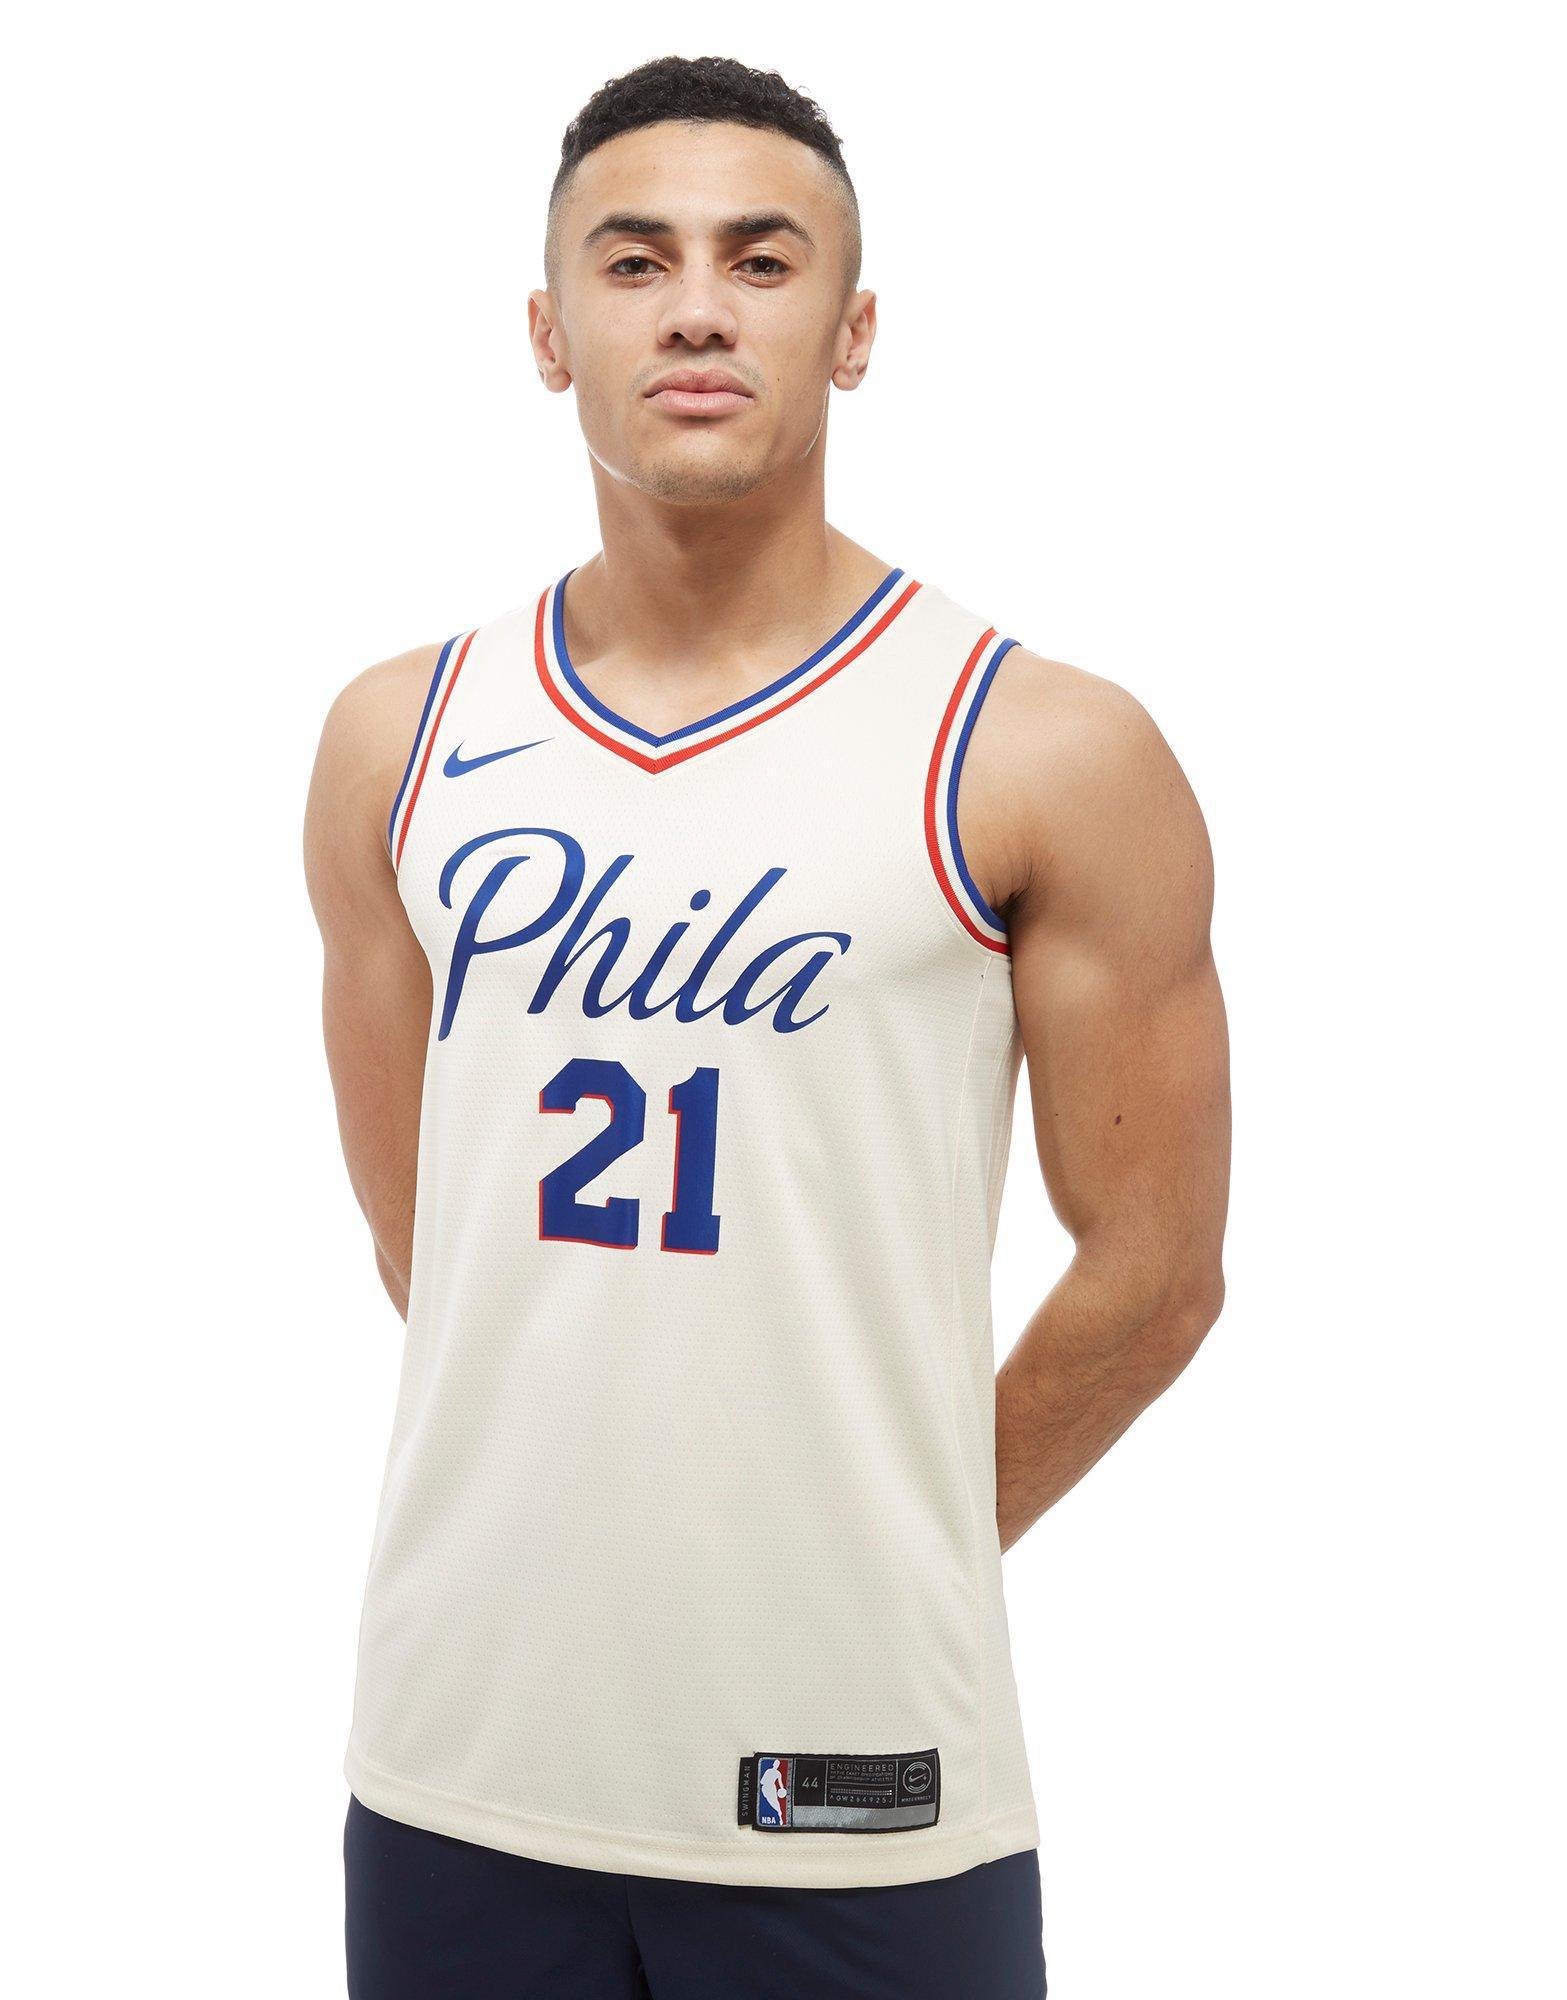 timeless design fdb2c 695fc Nike White Nba Embiid Philadelphia 76ers City Jersey for men